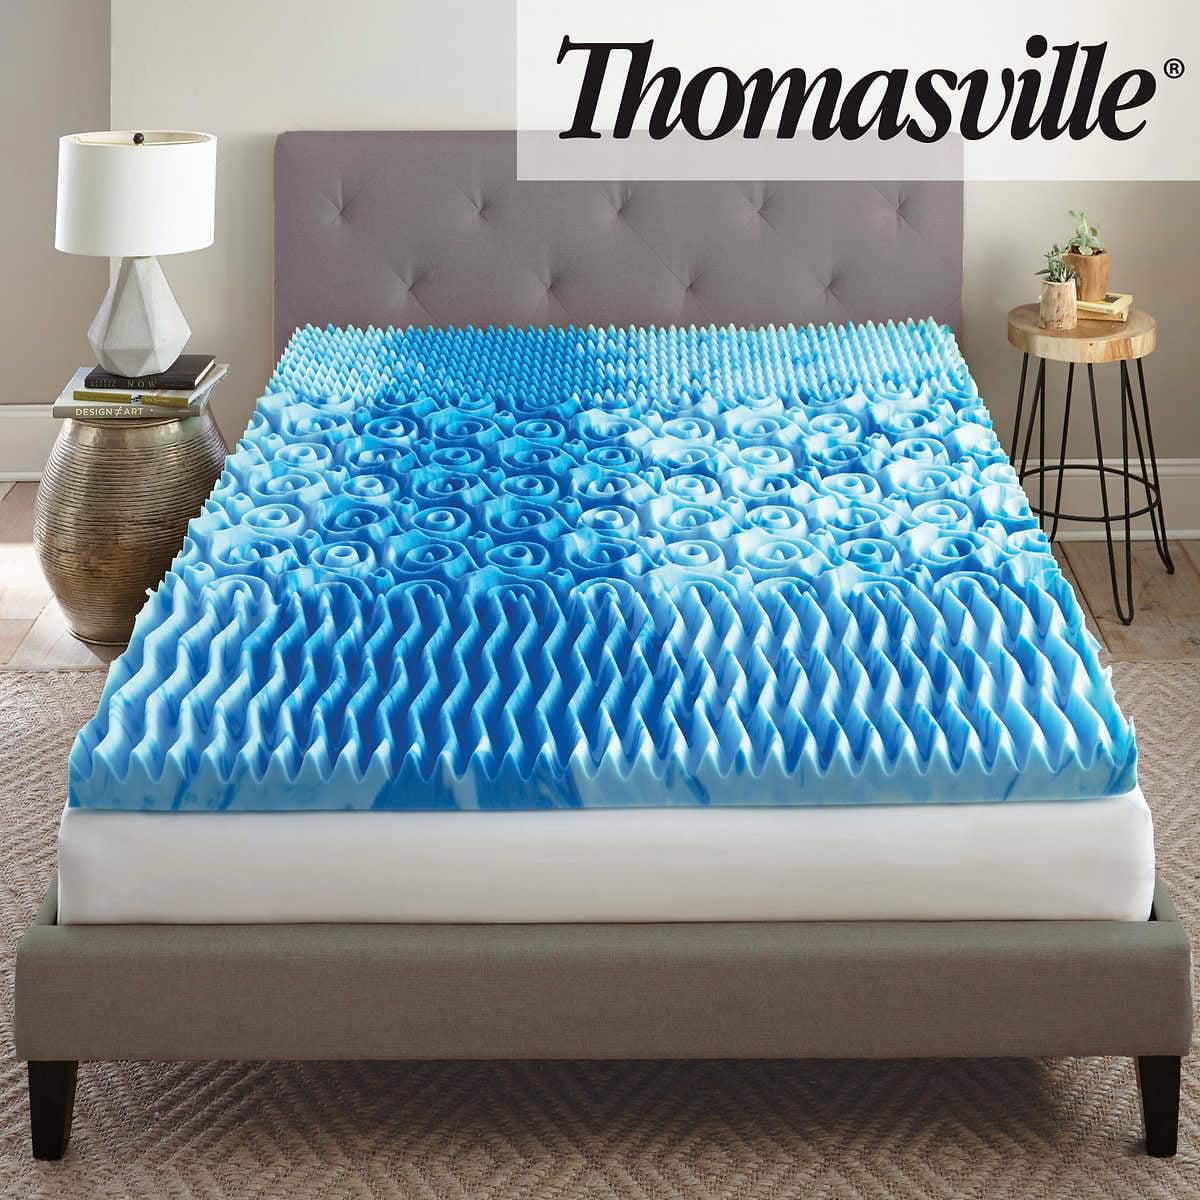 "Thomasville 3"" Cool Tri-zone Gel Memory Foam Mattress ..."